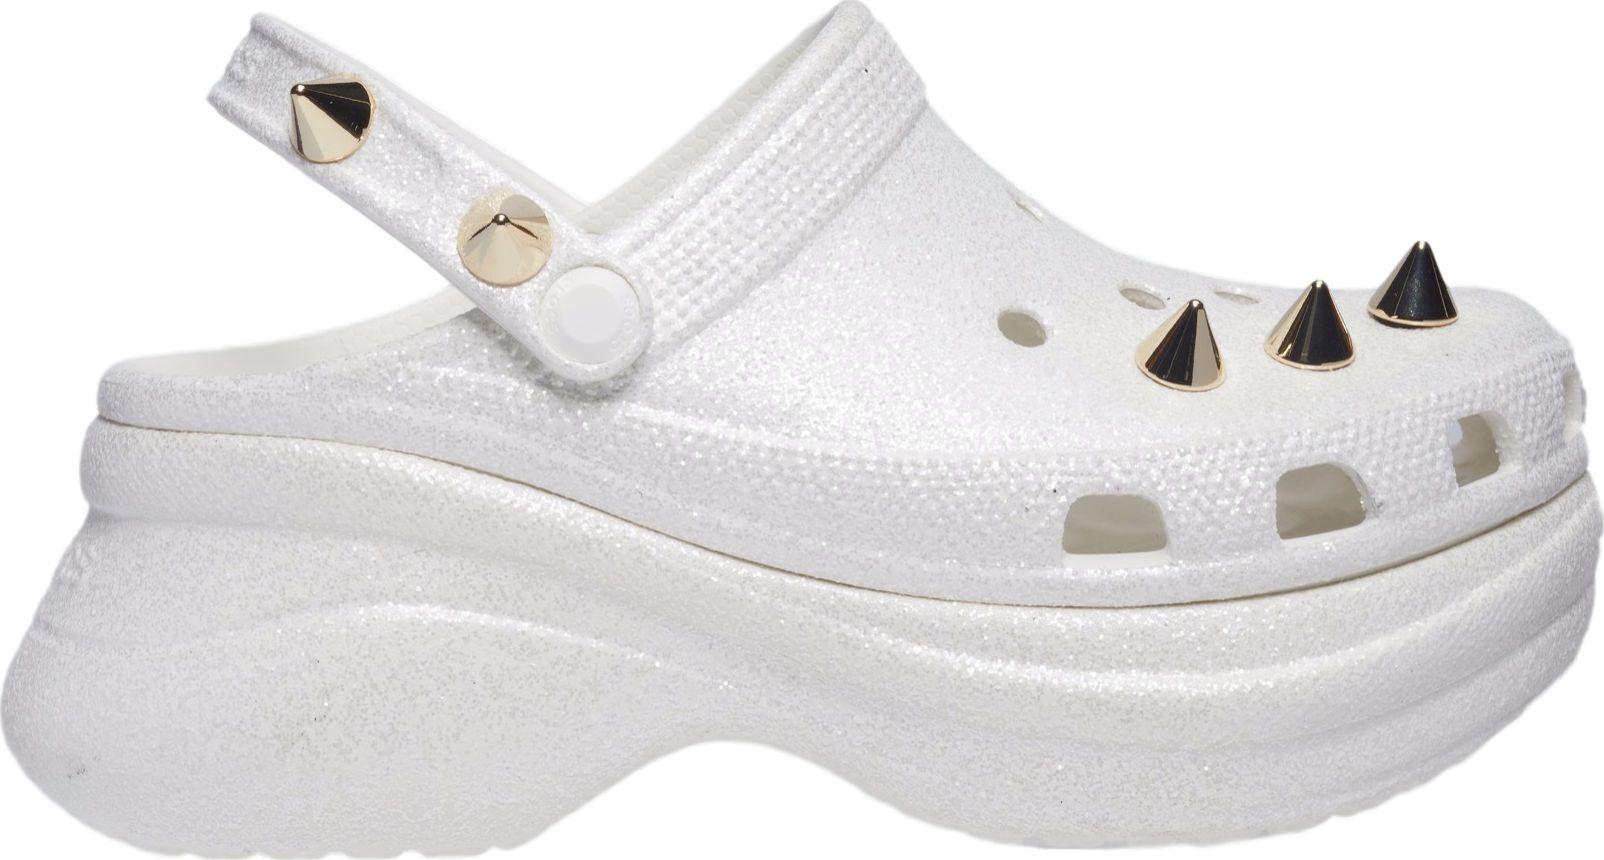 Crocs™ Classic Bae Glitter Stud Clog White 38,5